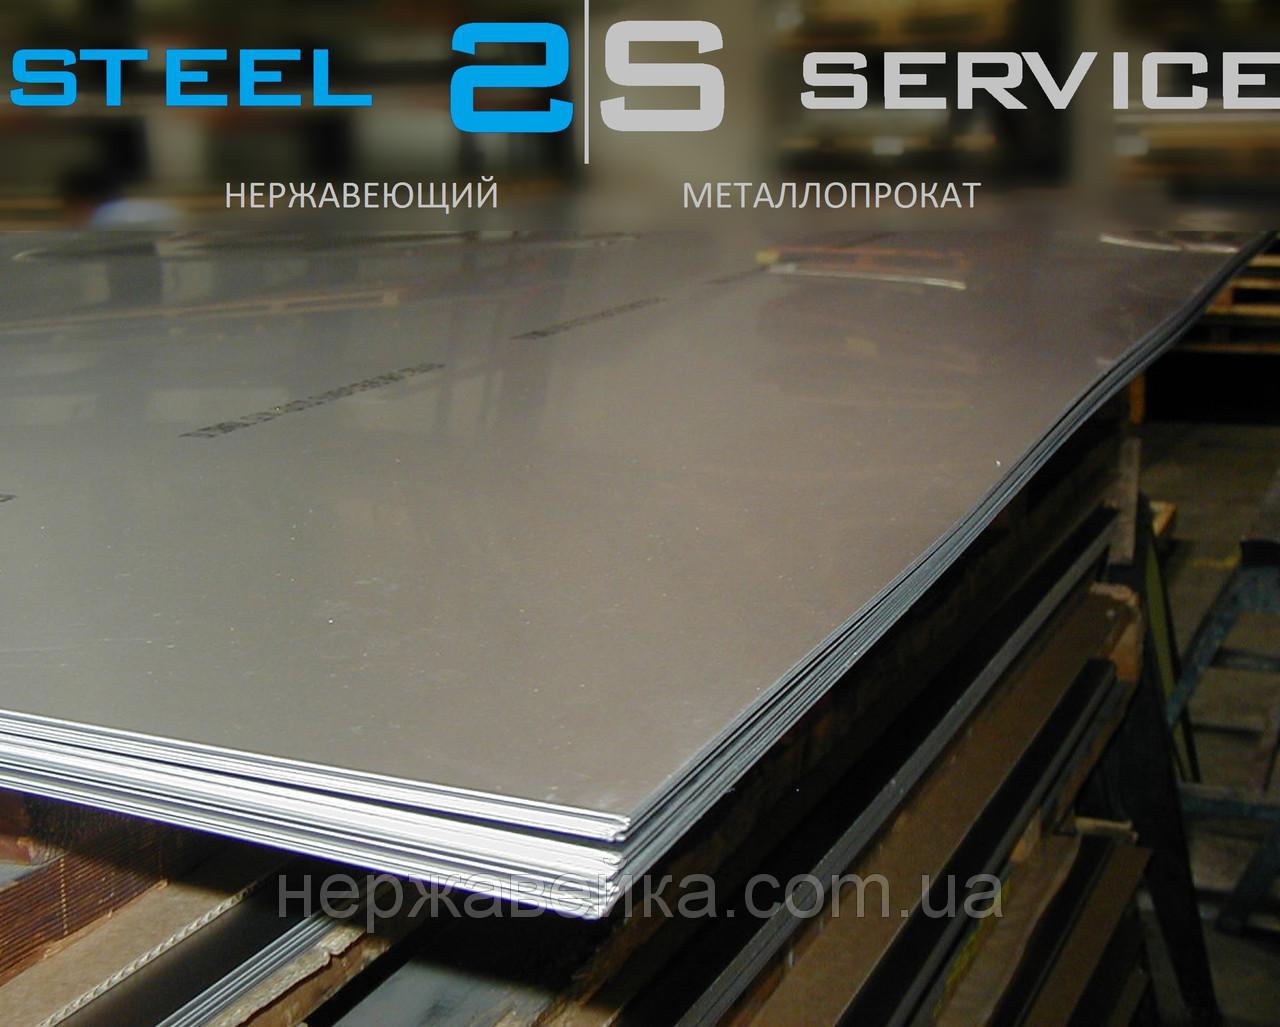 Нержавеющий лист 2х1500х3000мм  AISI 316L(03Х17Н14М3) 4N - шлифованный,  кислотостойкий